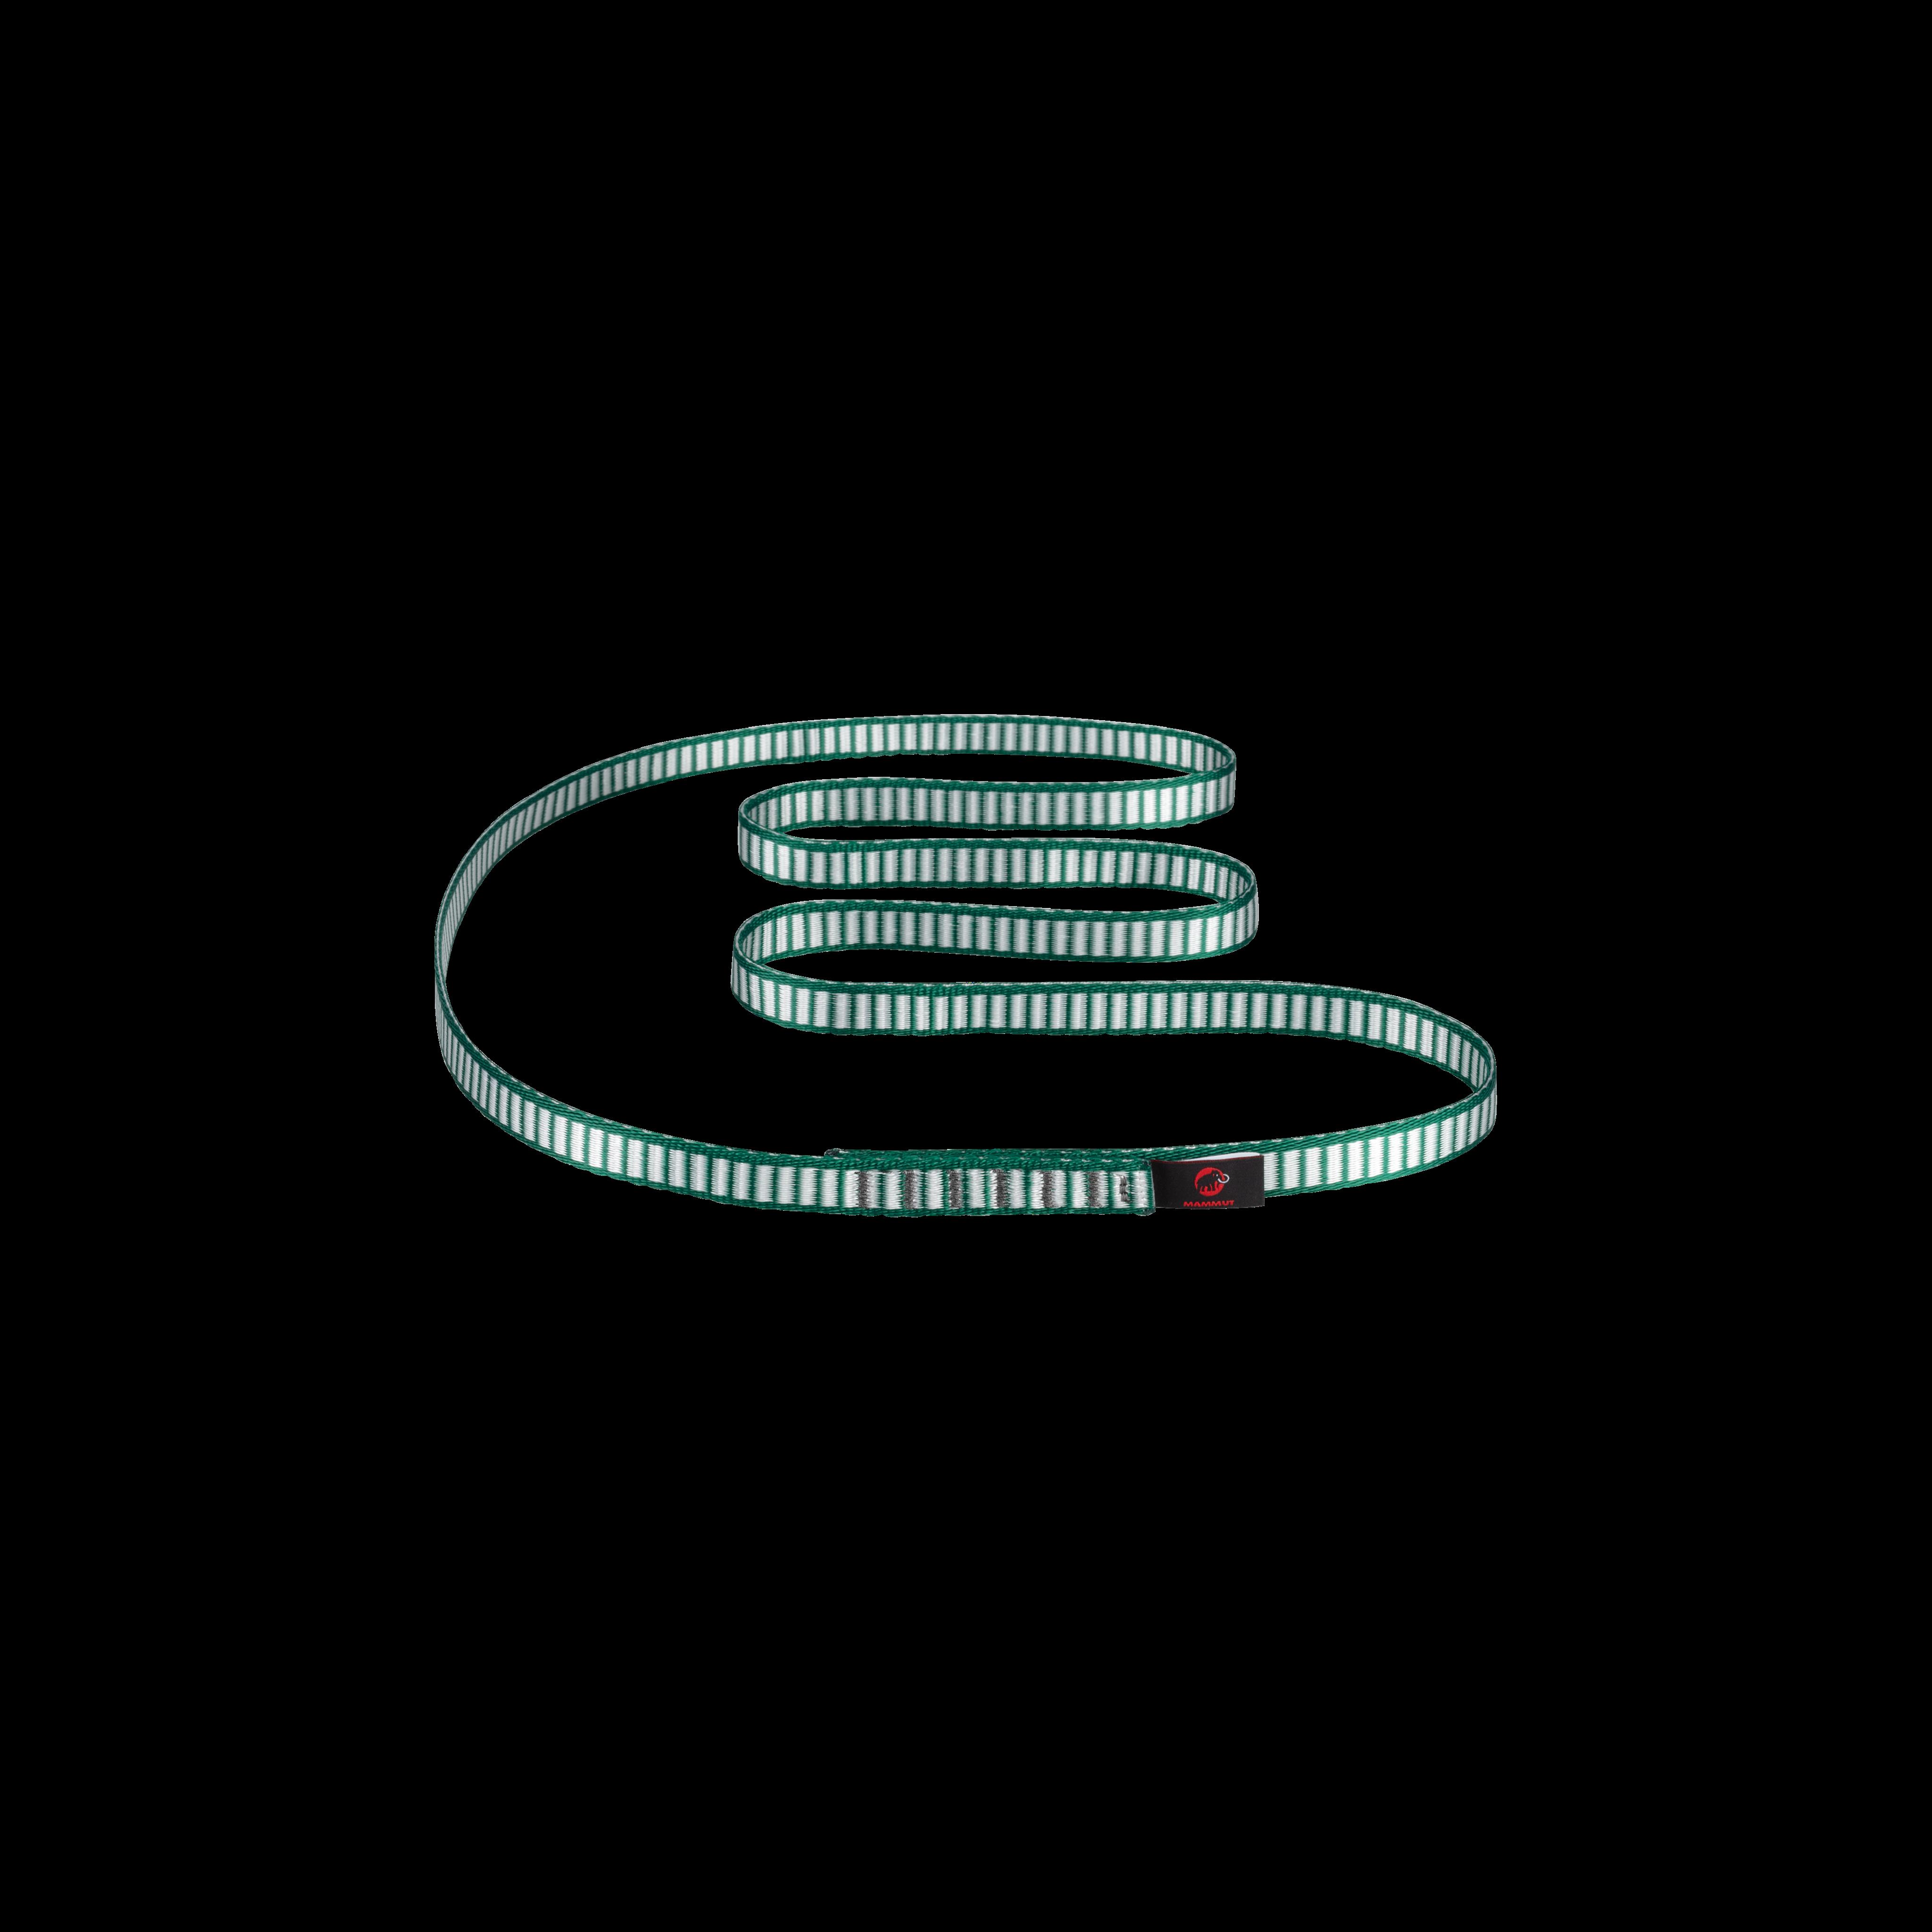 Tubular Sling 16.0 - 80 cm, green thumbnail